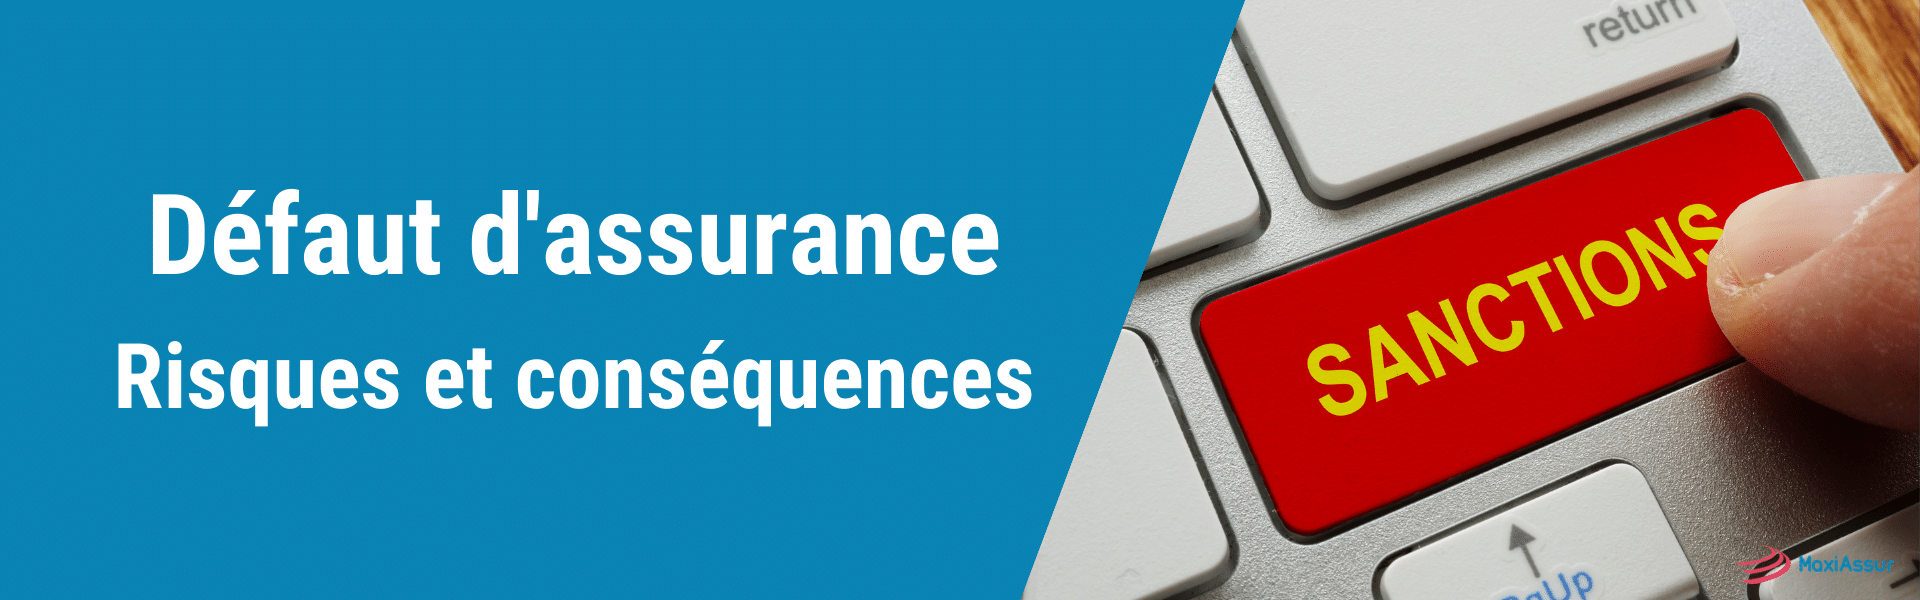 défaut d'assurance